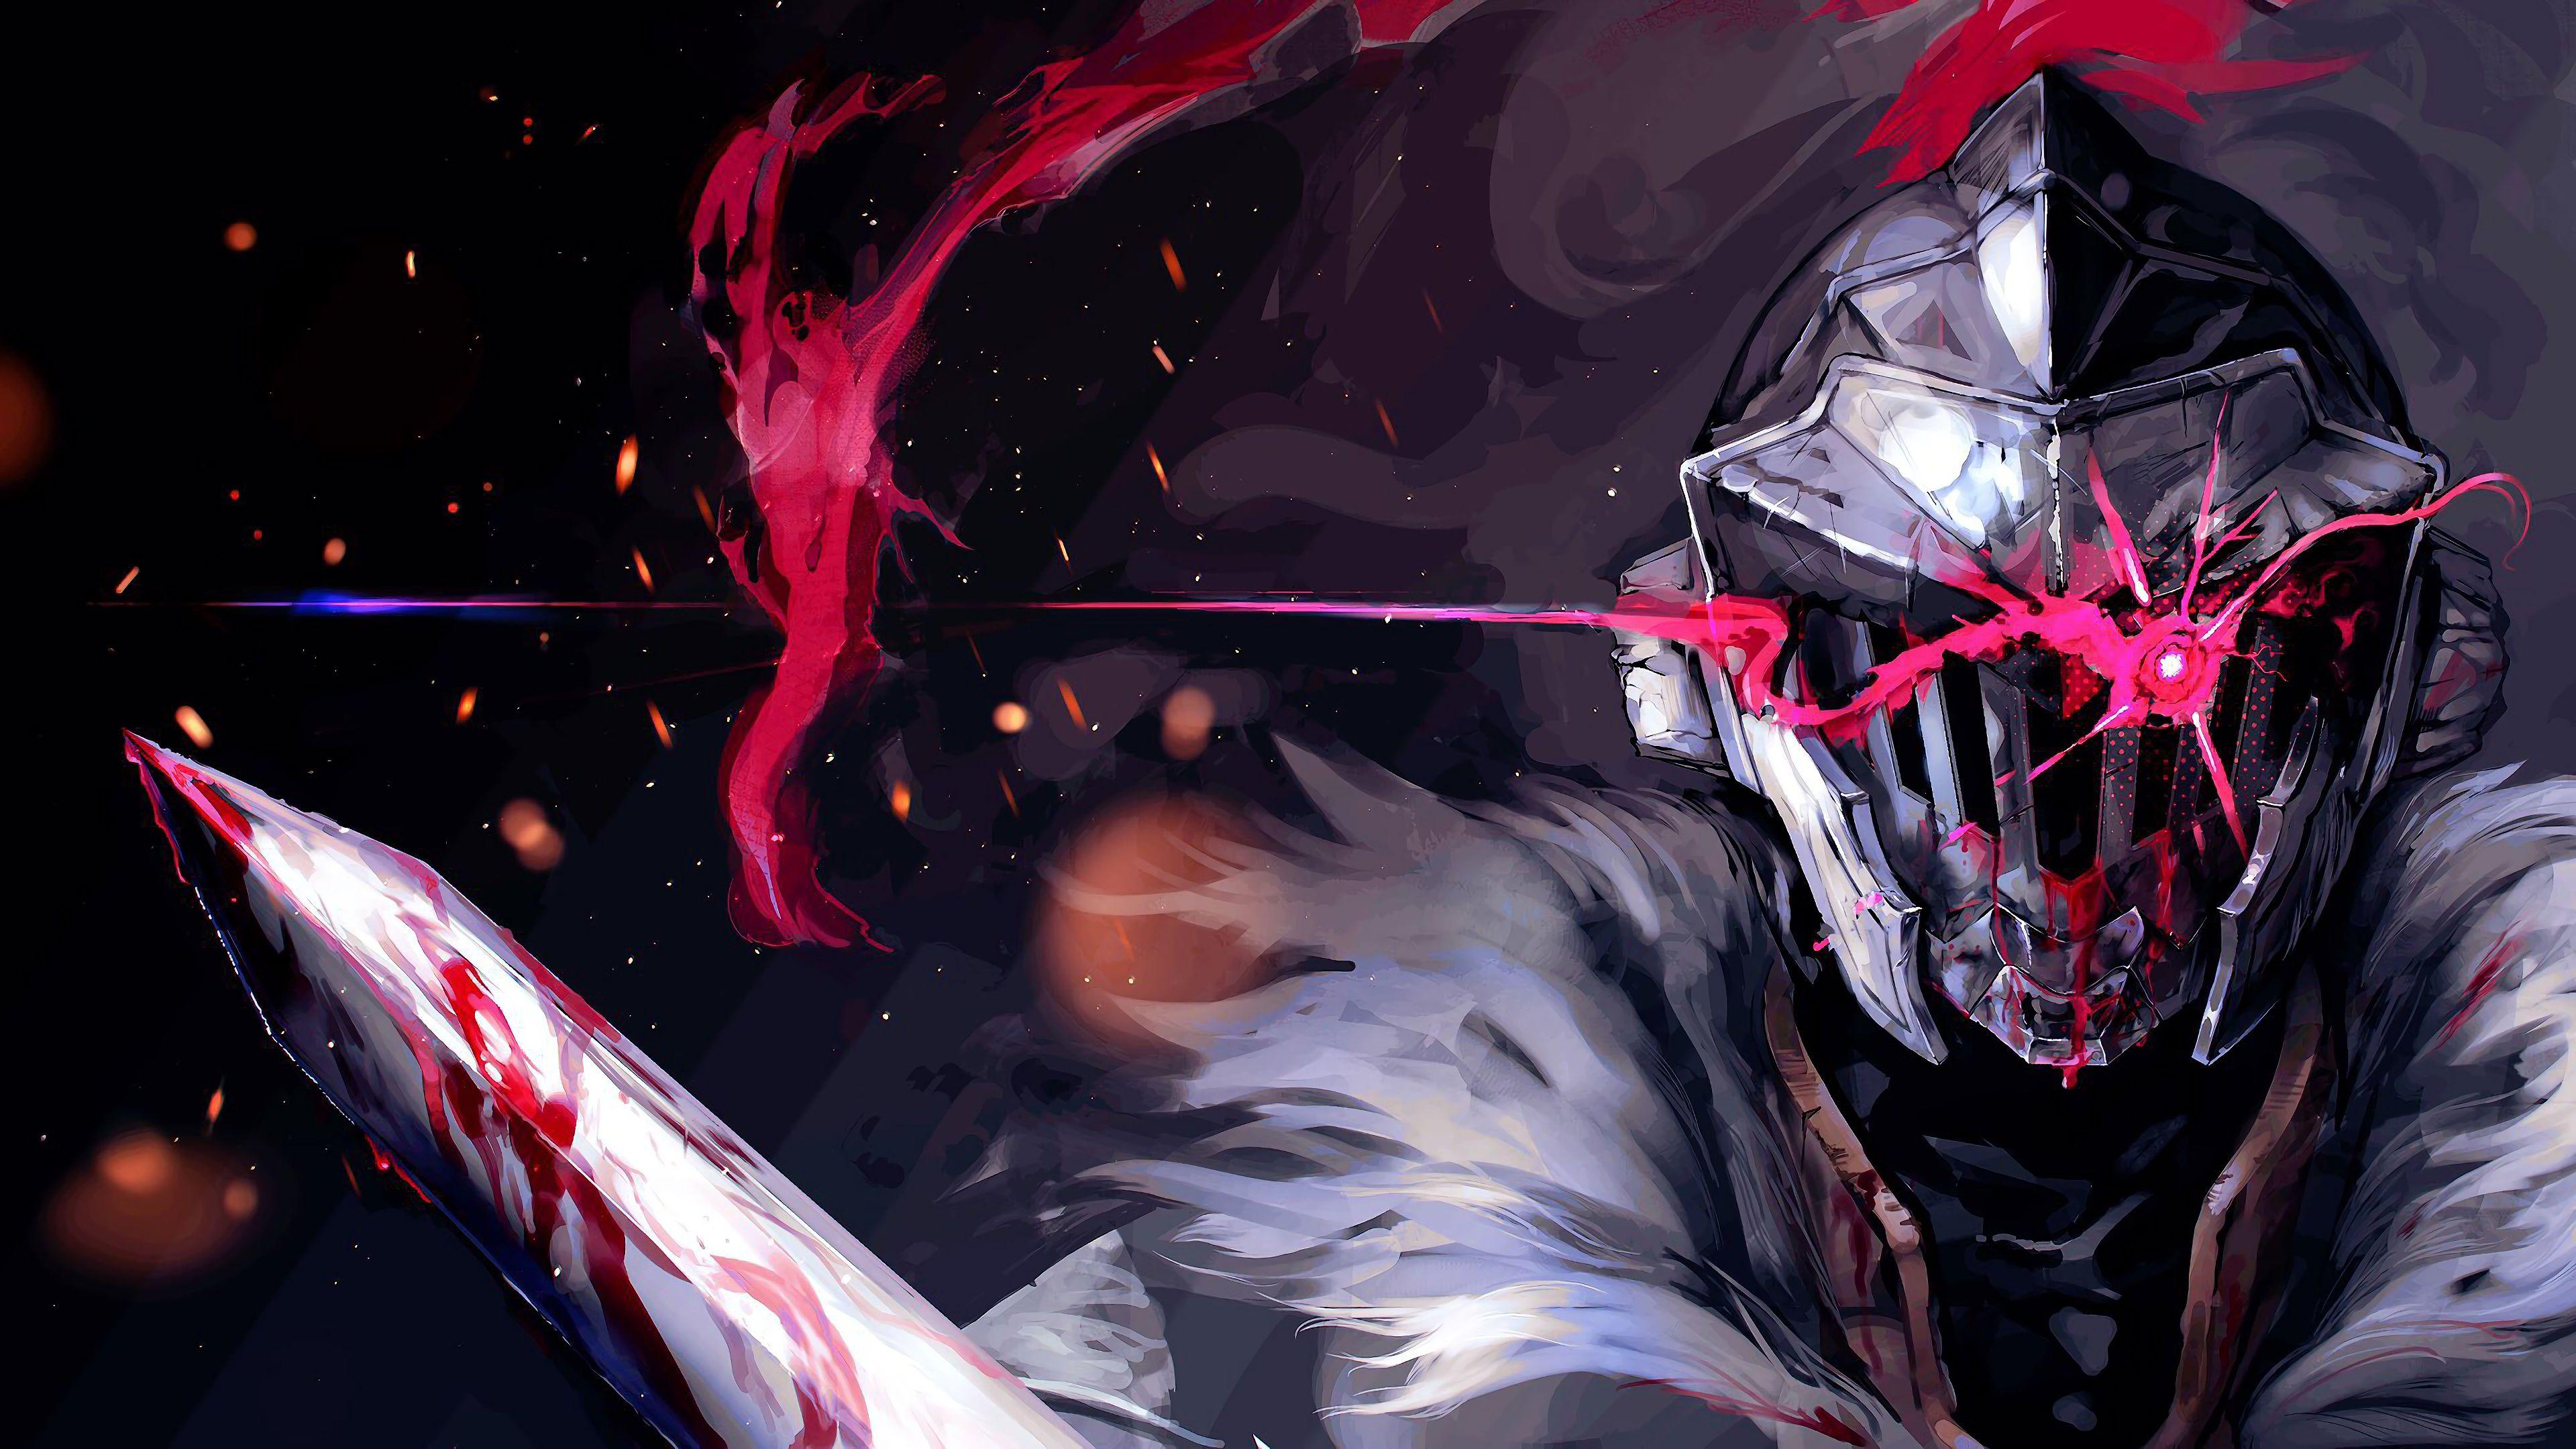 Goblin Slayer Anime 4K 28106 Slayer anime, Goblin, Anime